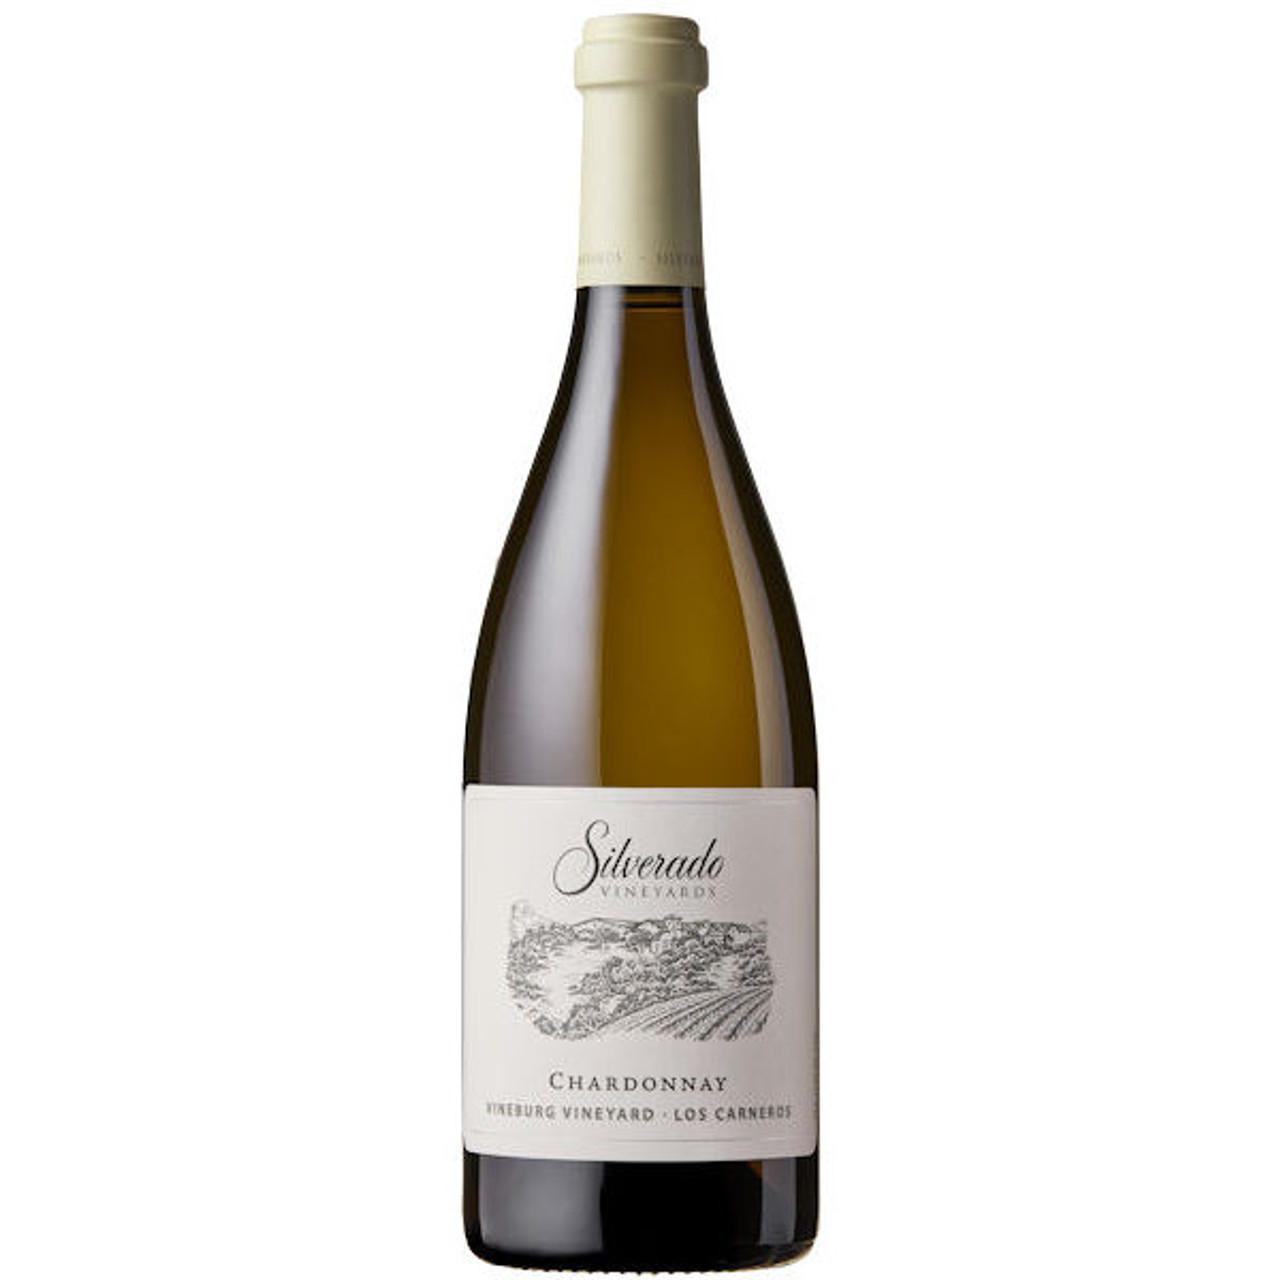 12 Bottle Case Silverado Estate Los Carneros Chardonnay 2017 W Free Shipping